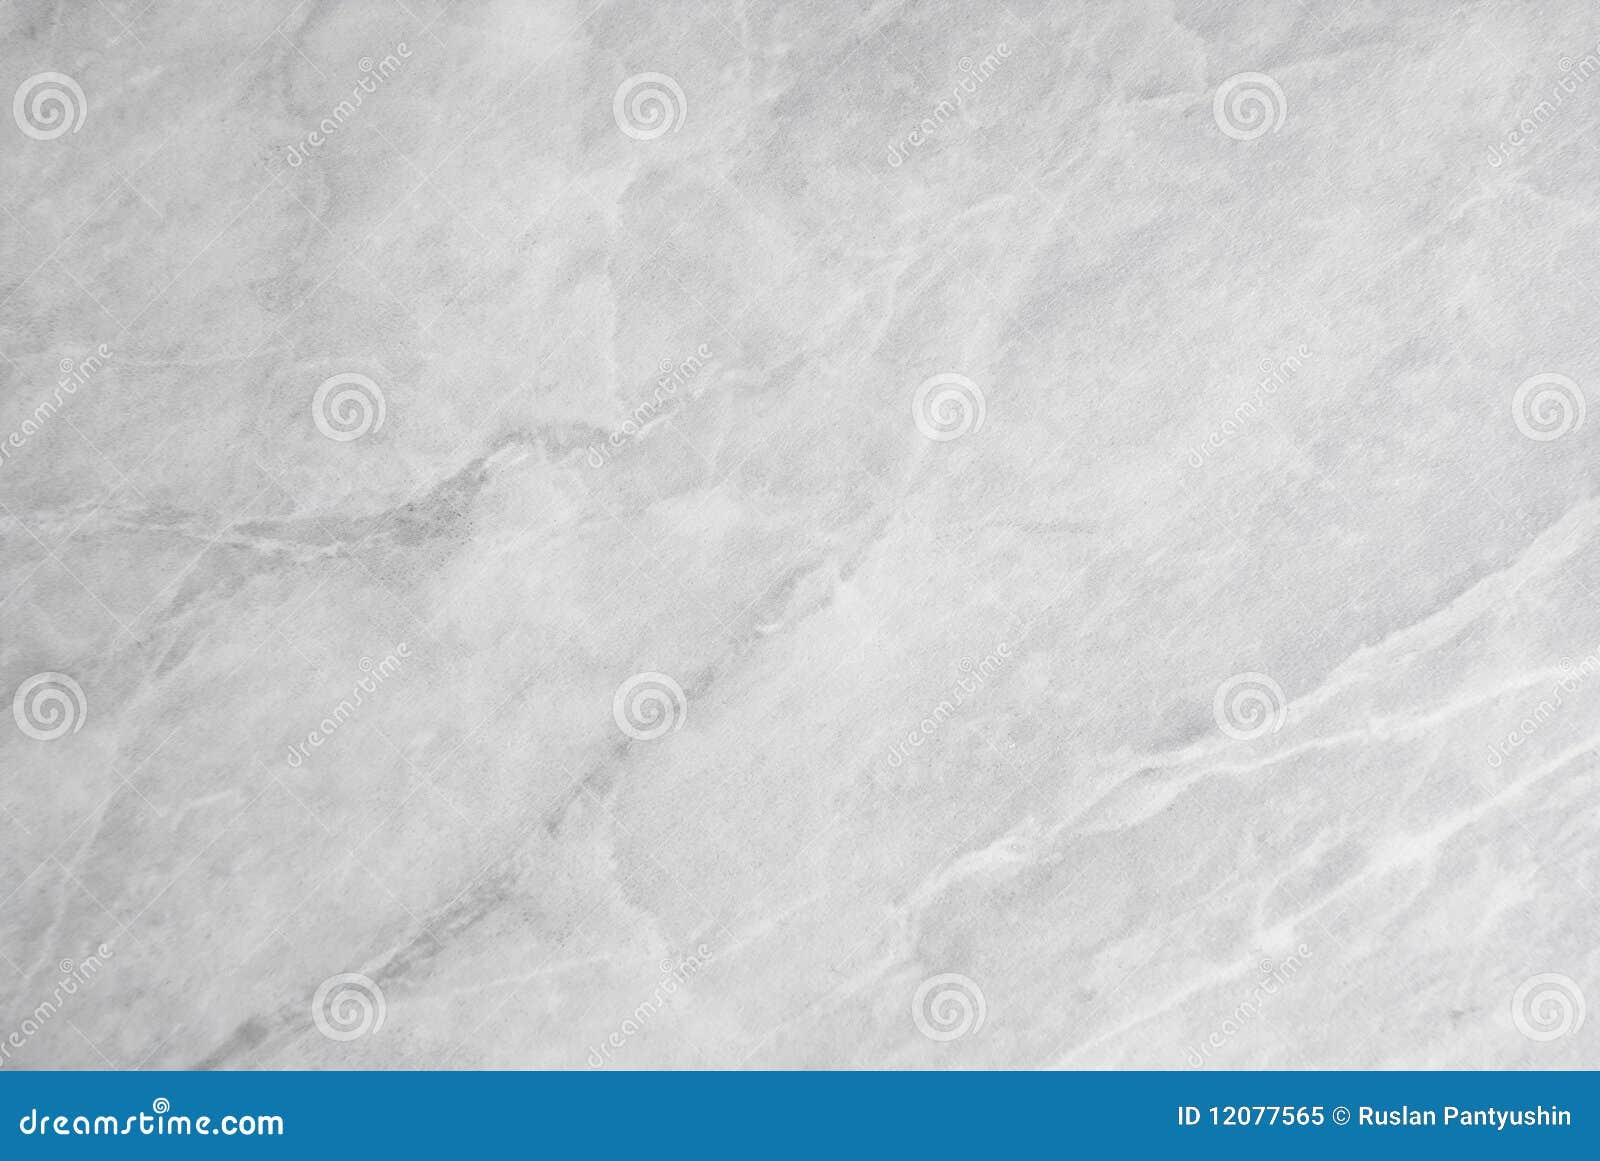 Placa de mármol